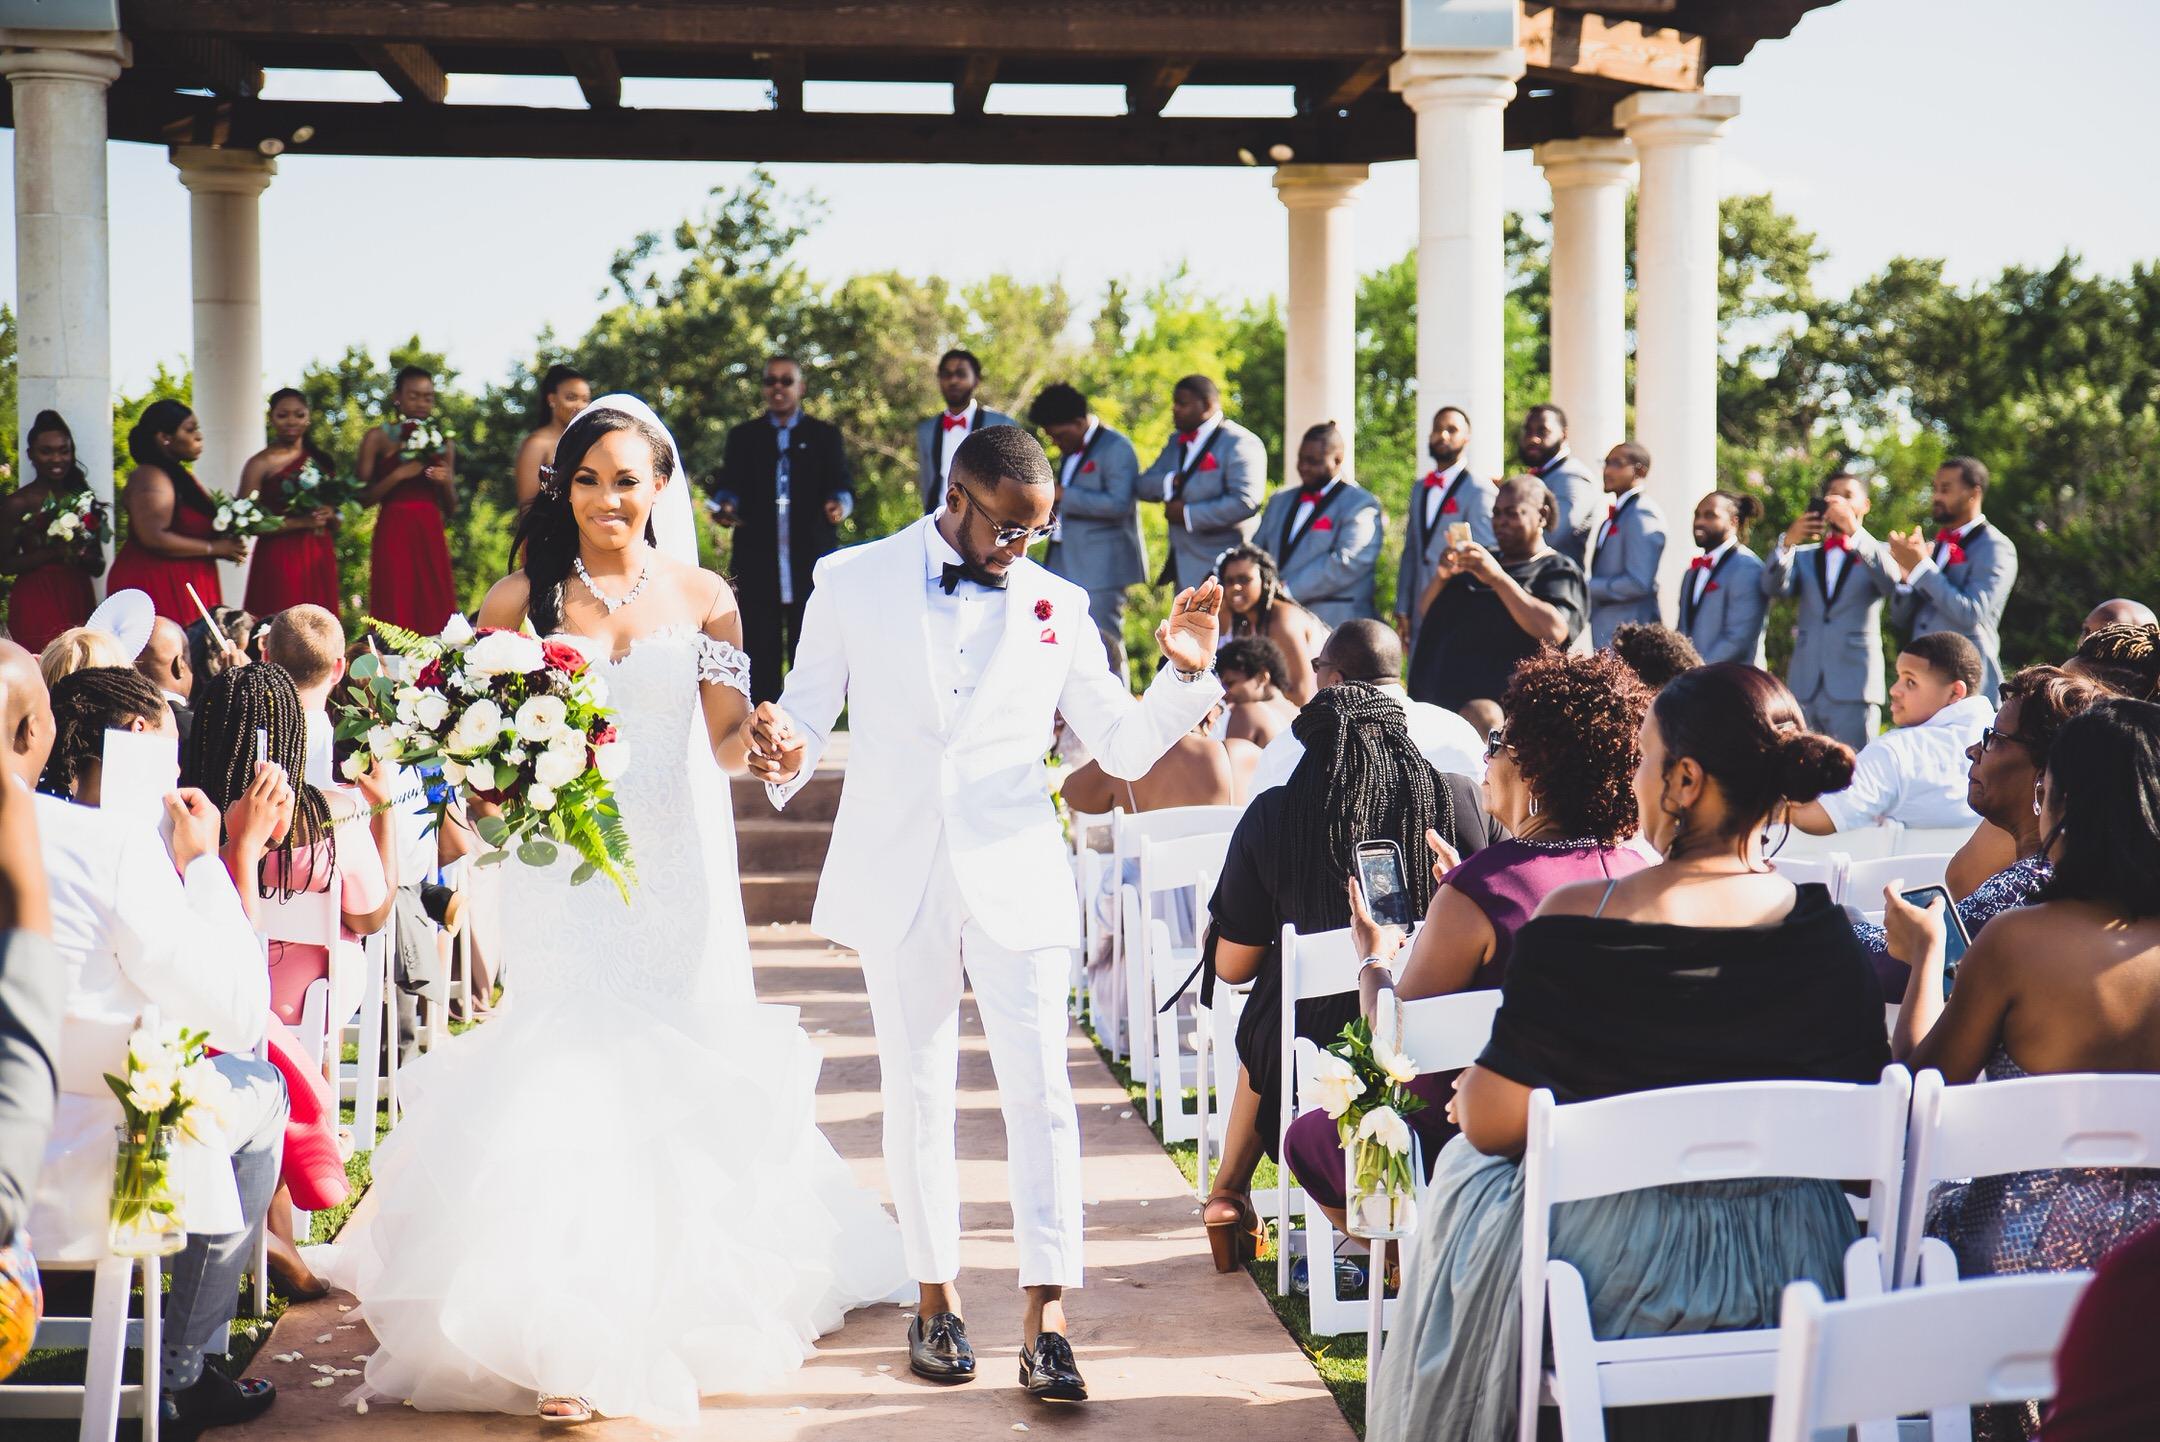 Leon-Contreras-Houston-Texas-Aggie-Wedding-Graduation-Engagement-Portrait-Photographer-1480.jpg